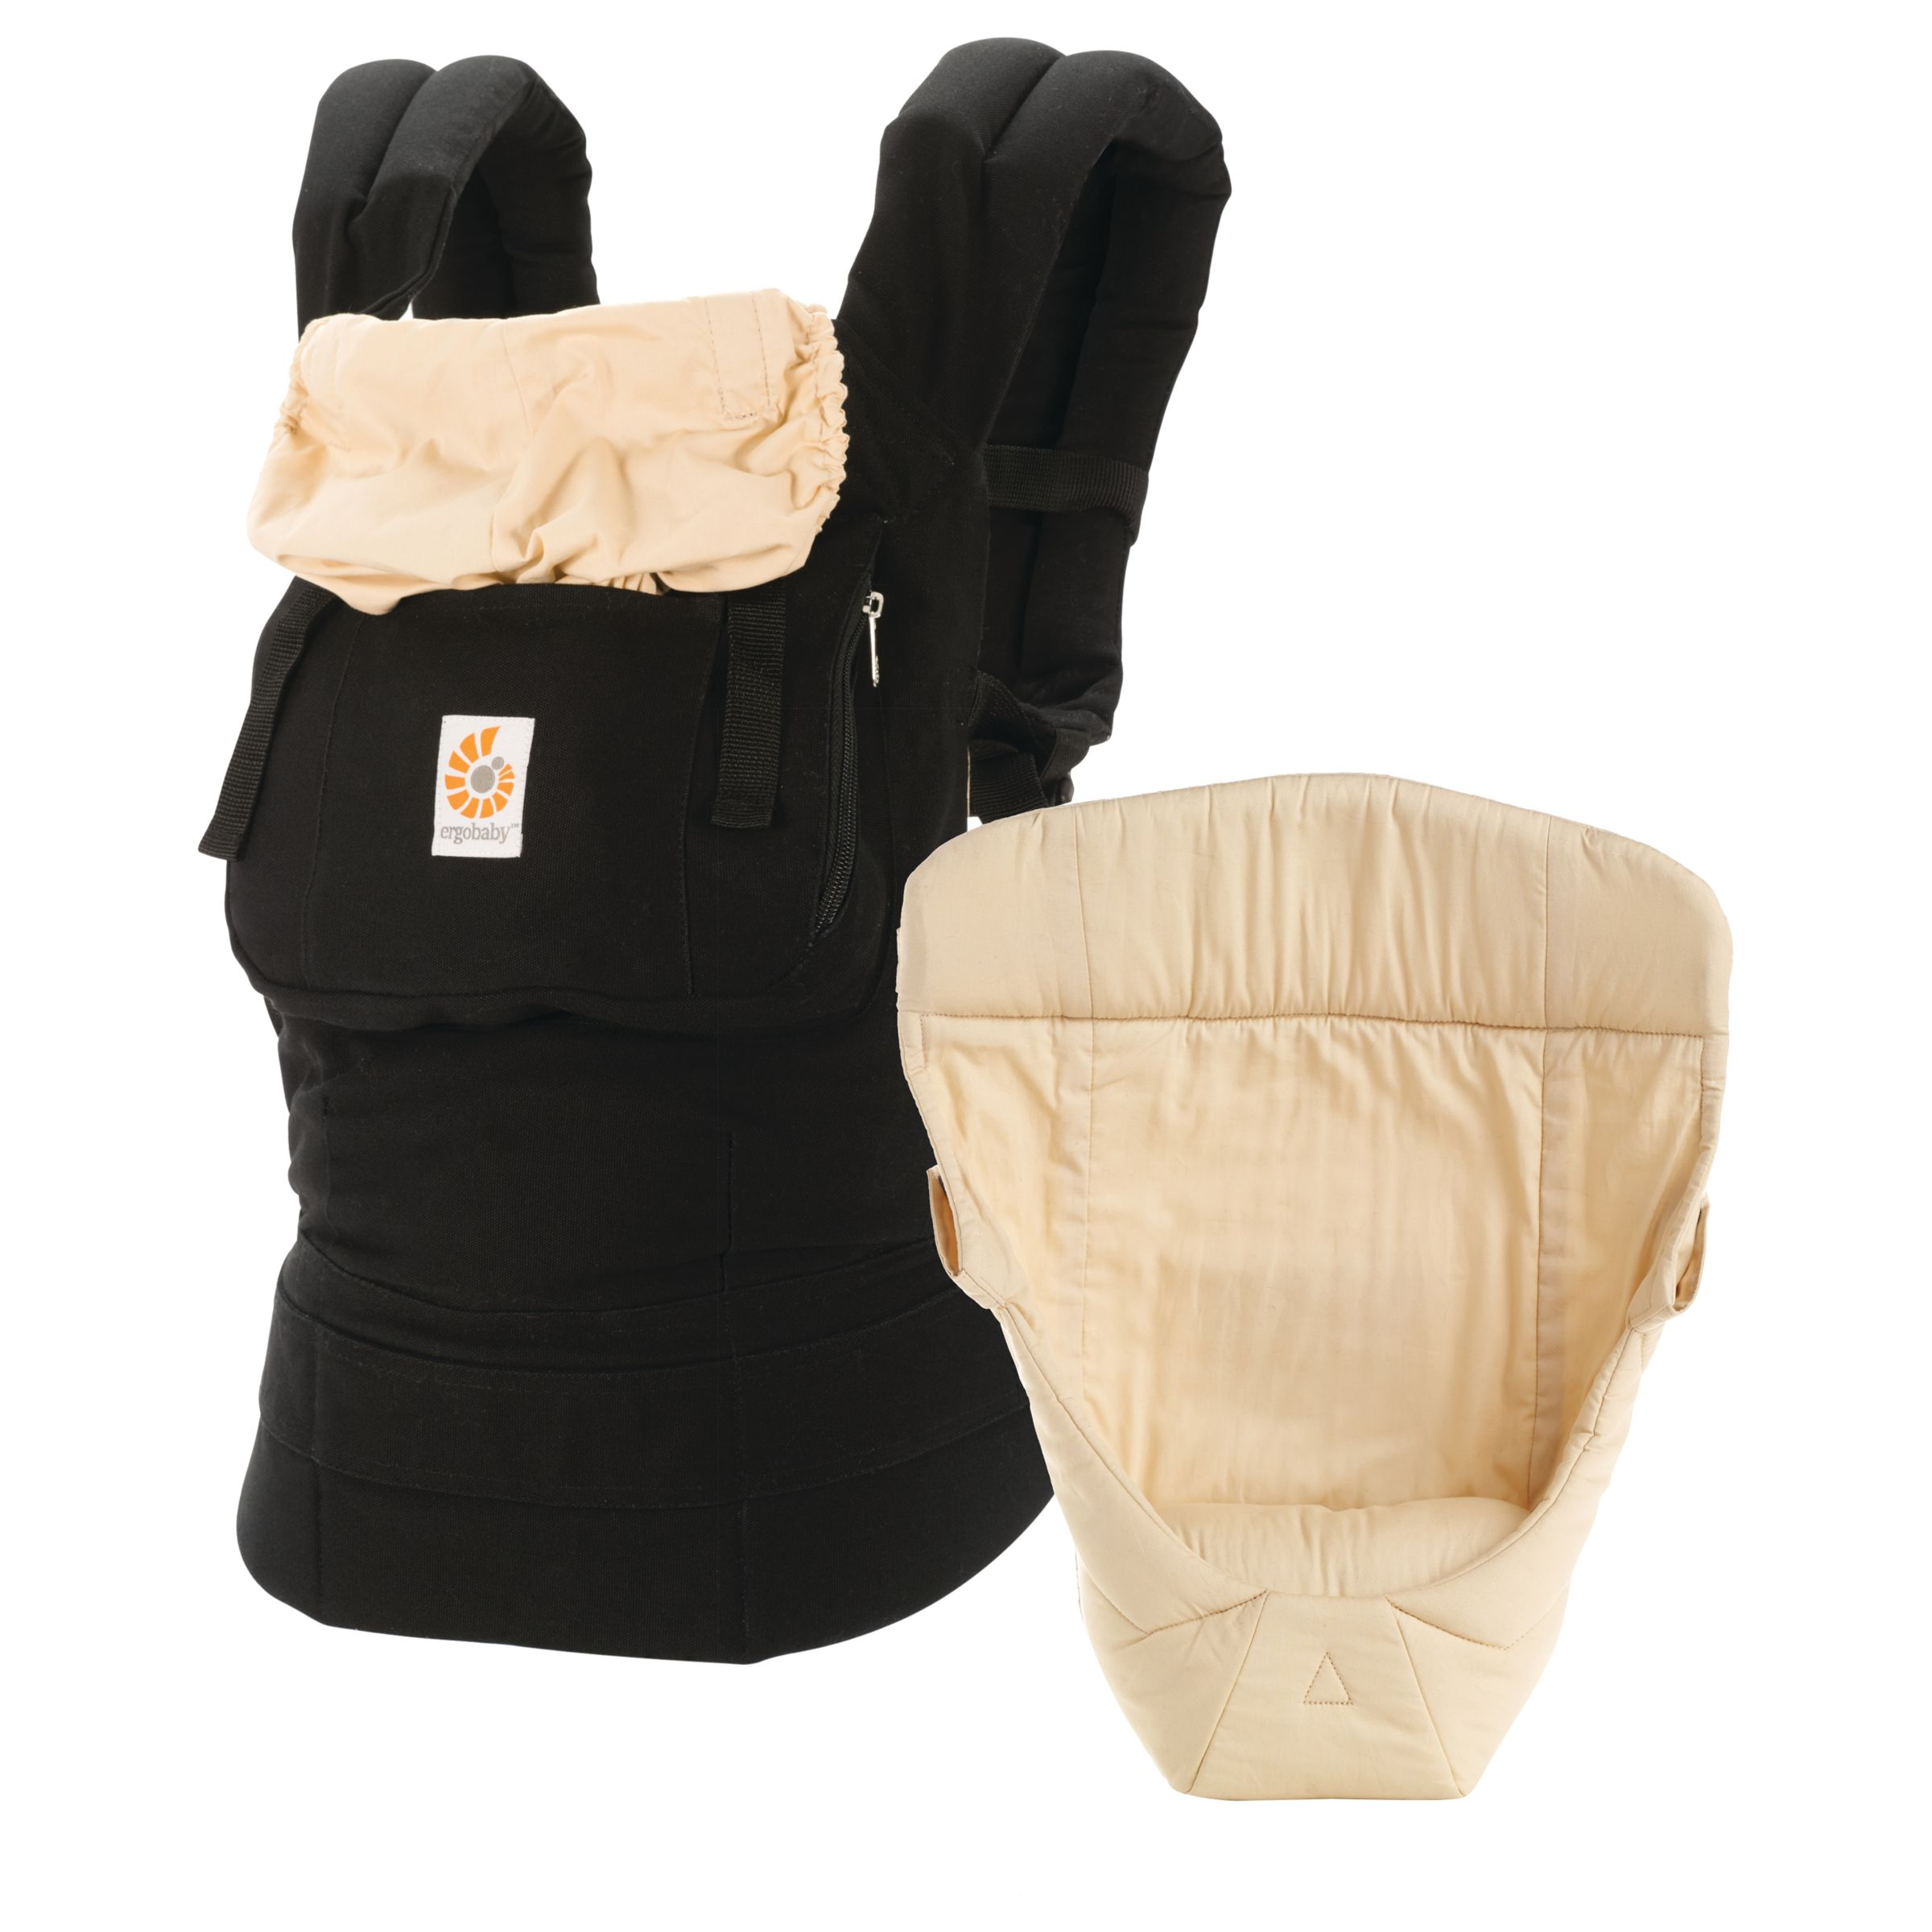 Ergobaby Ergobaby Original Baby Carrier & Infant Insert, Black